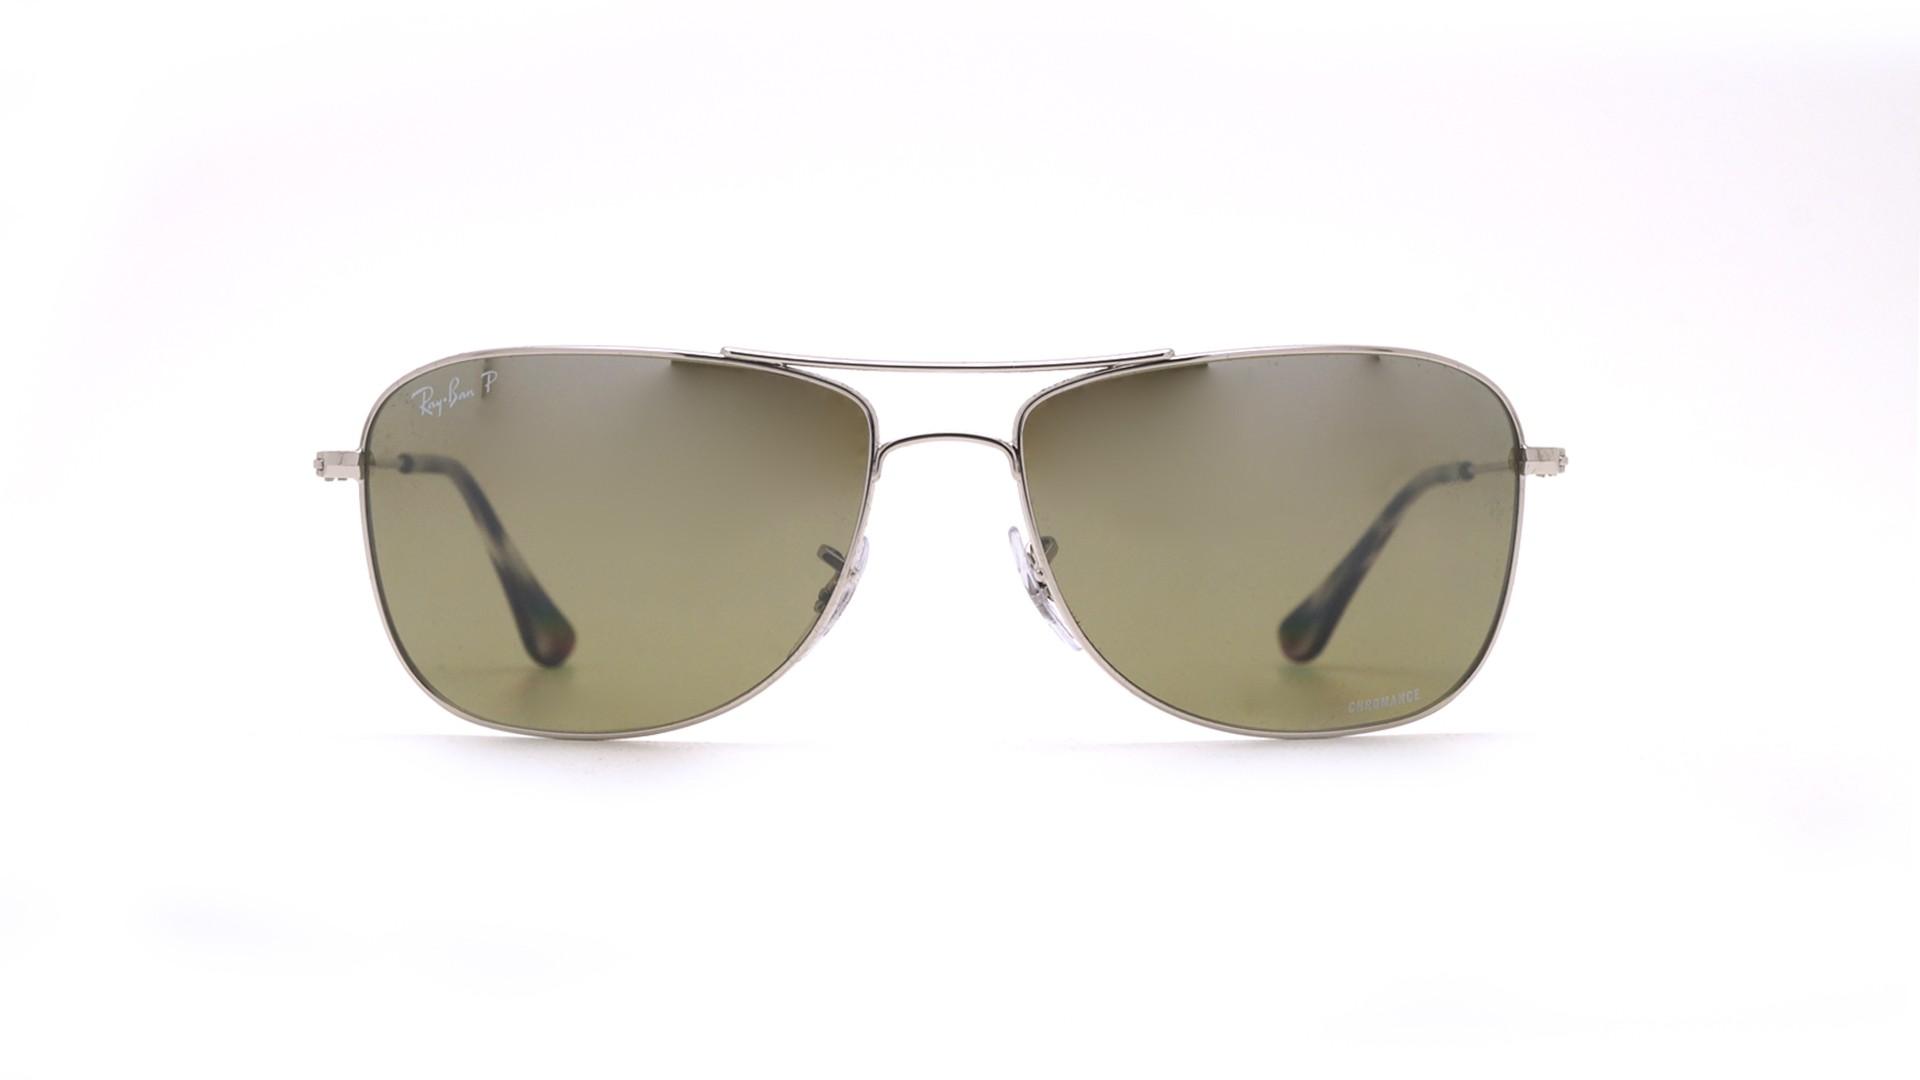 a9355101217cd Sunglasses Ray-Ban RB3543 003 5J 59-16 Silver Chromance Medium Polarized  Gradient Mirror